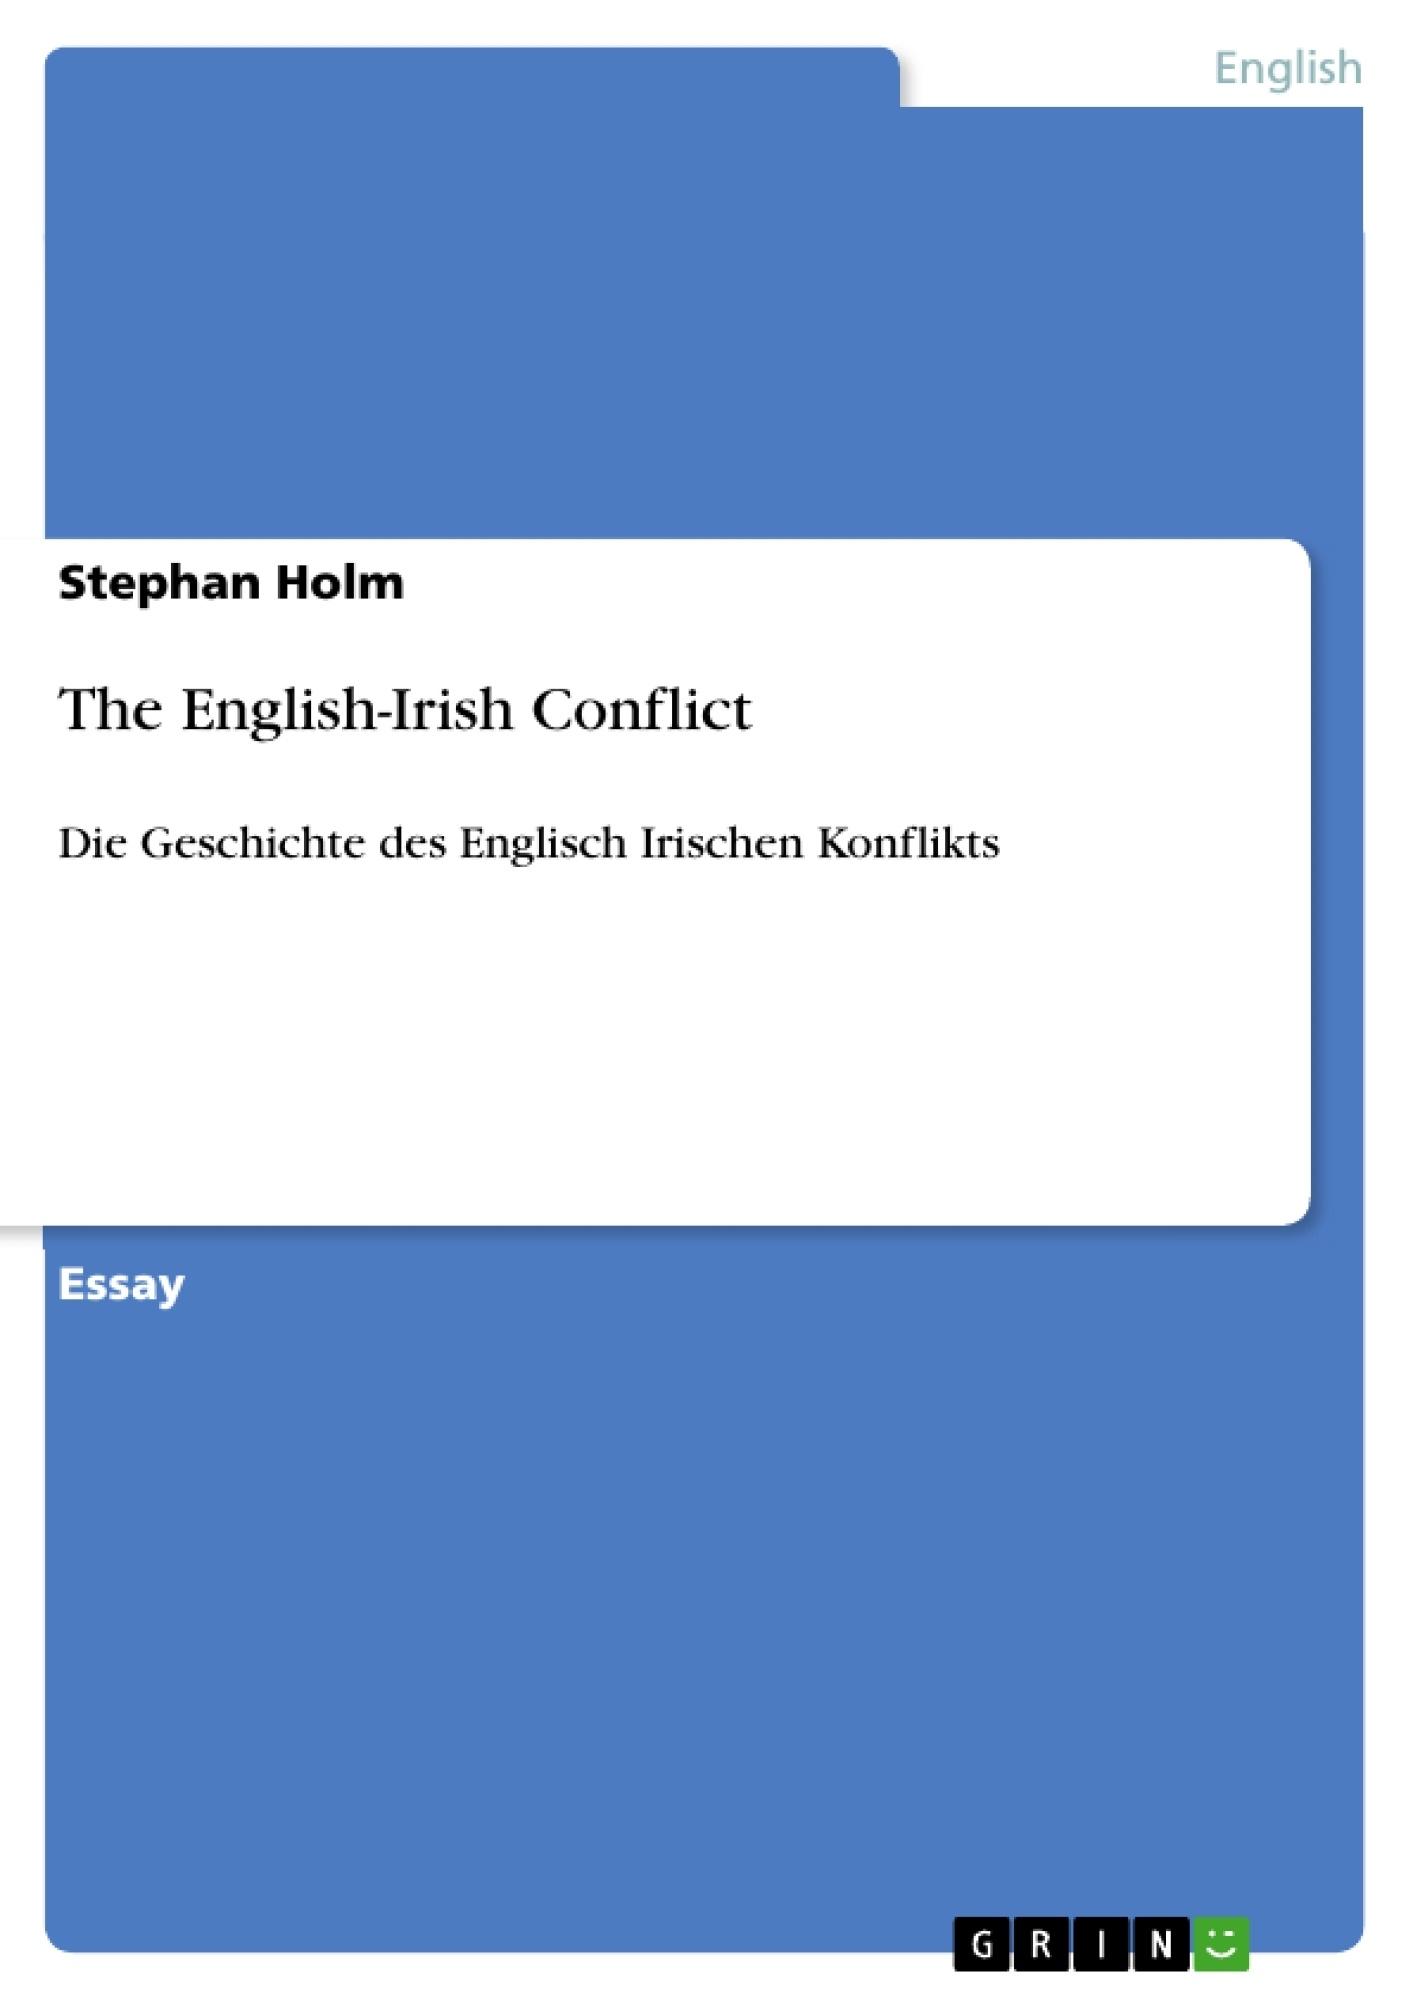 Title: The English-Irish Conflict